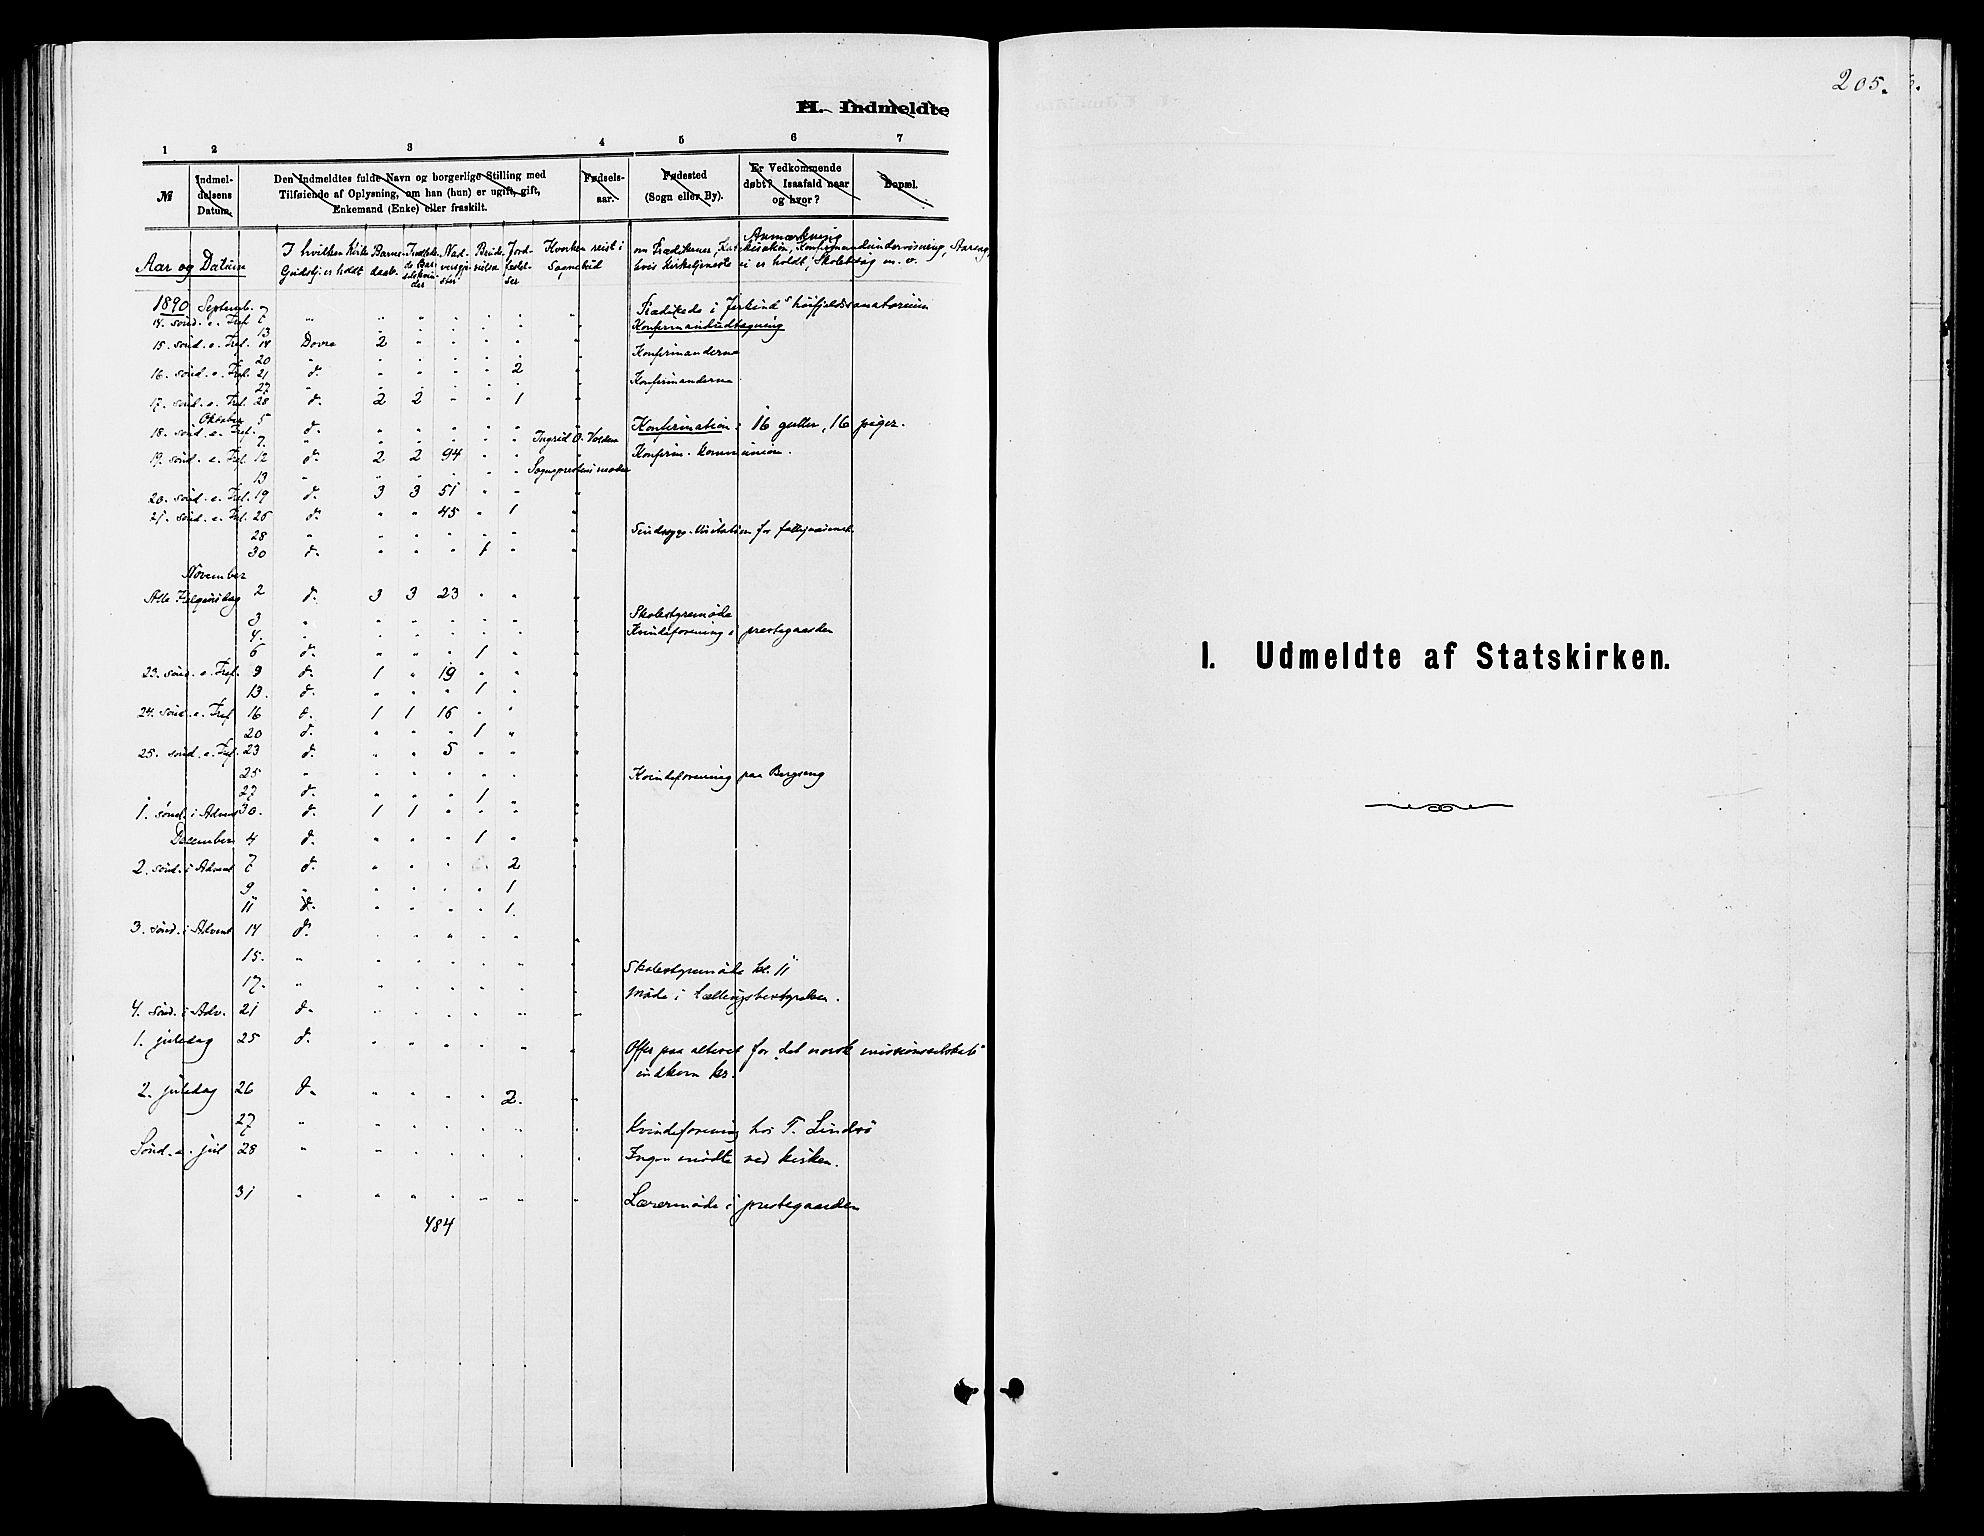 SAH, Dovre prestekontor, Ministerialbok nr. 2, 1879-1890, s. 205